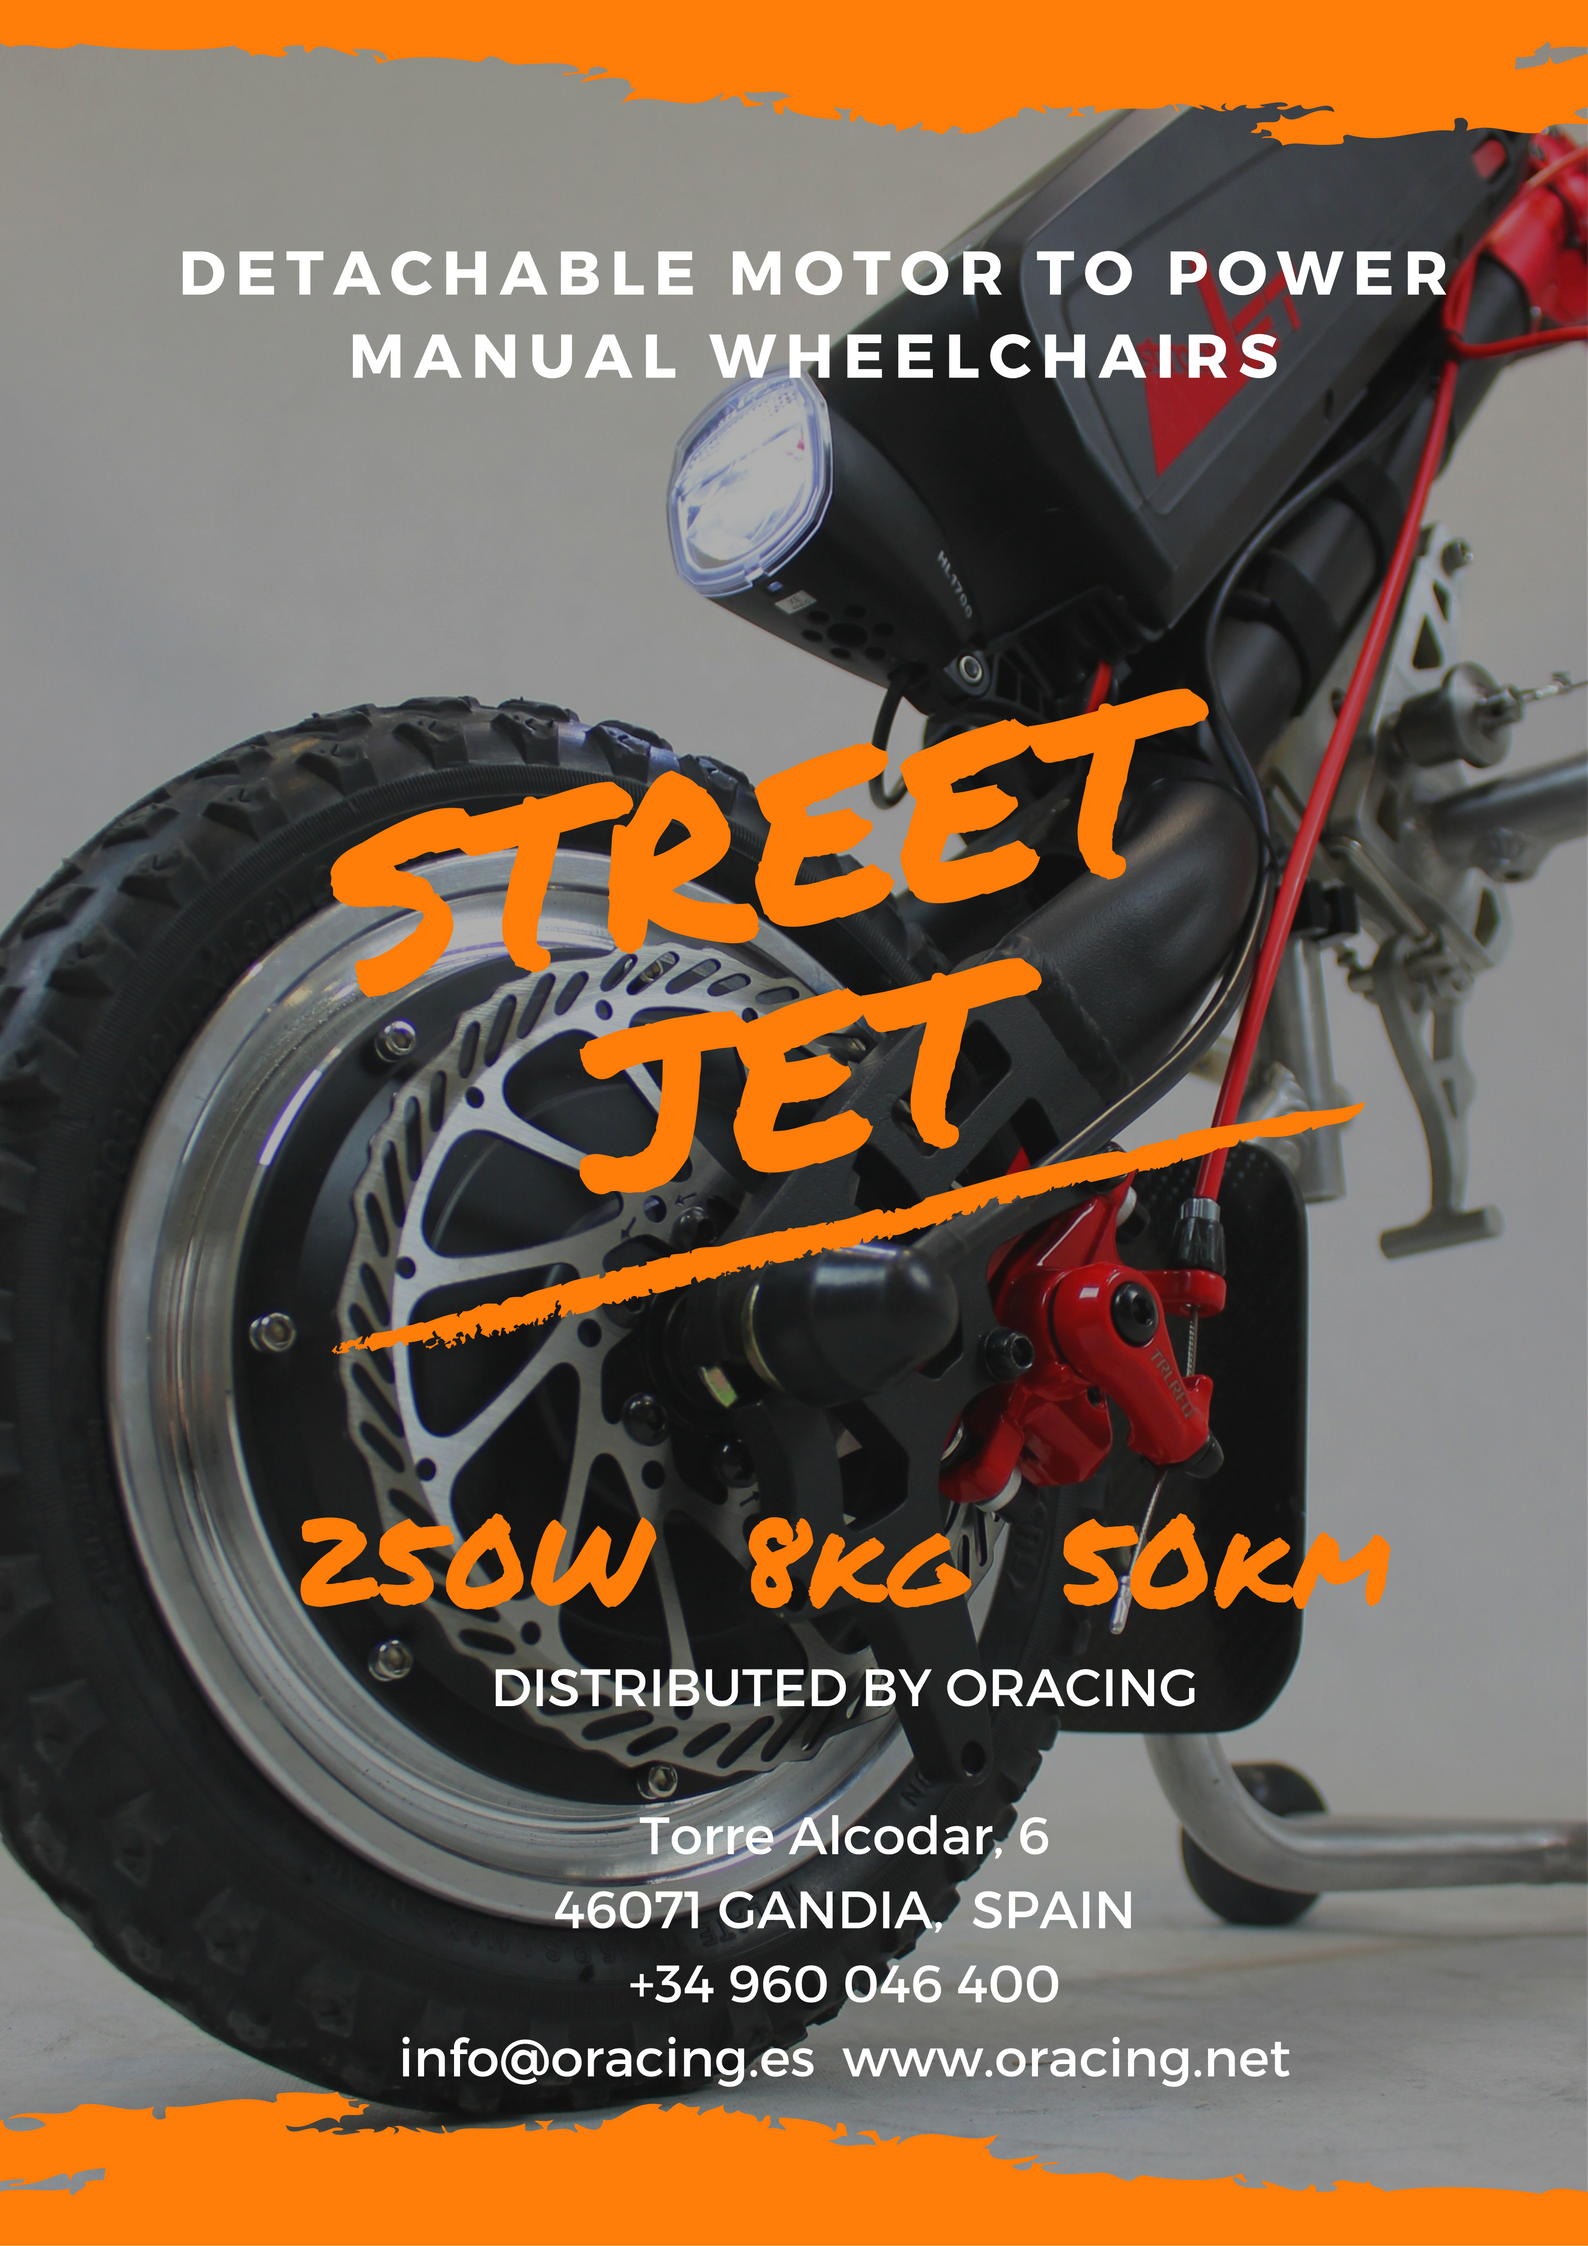 street jet detachable motor to power manual wheelchair 8kg weight rh pinterest com lcd manual wheelchair bases lcd manual wheelchair bases